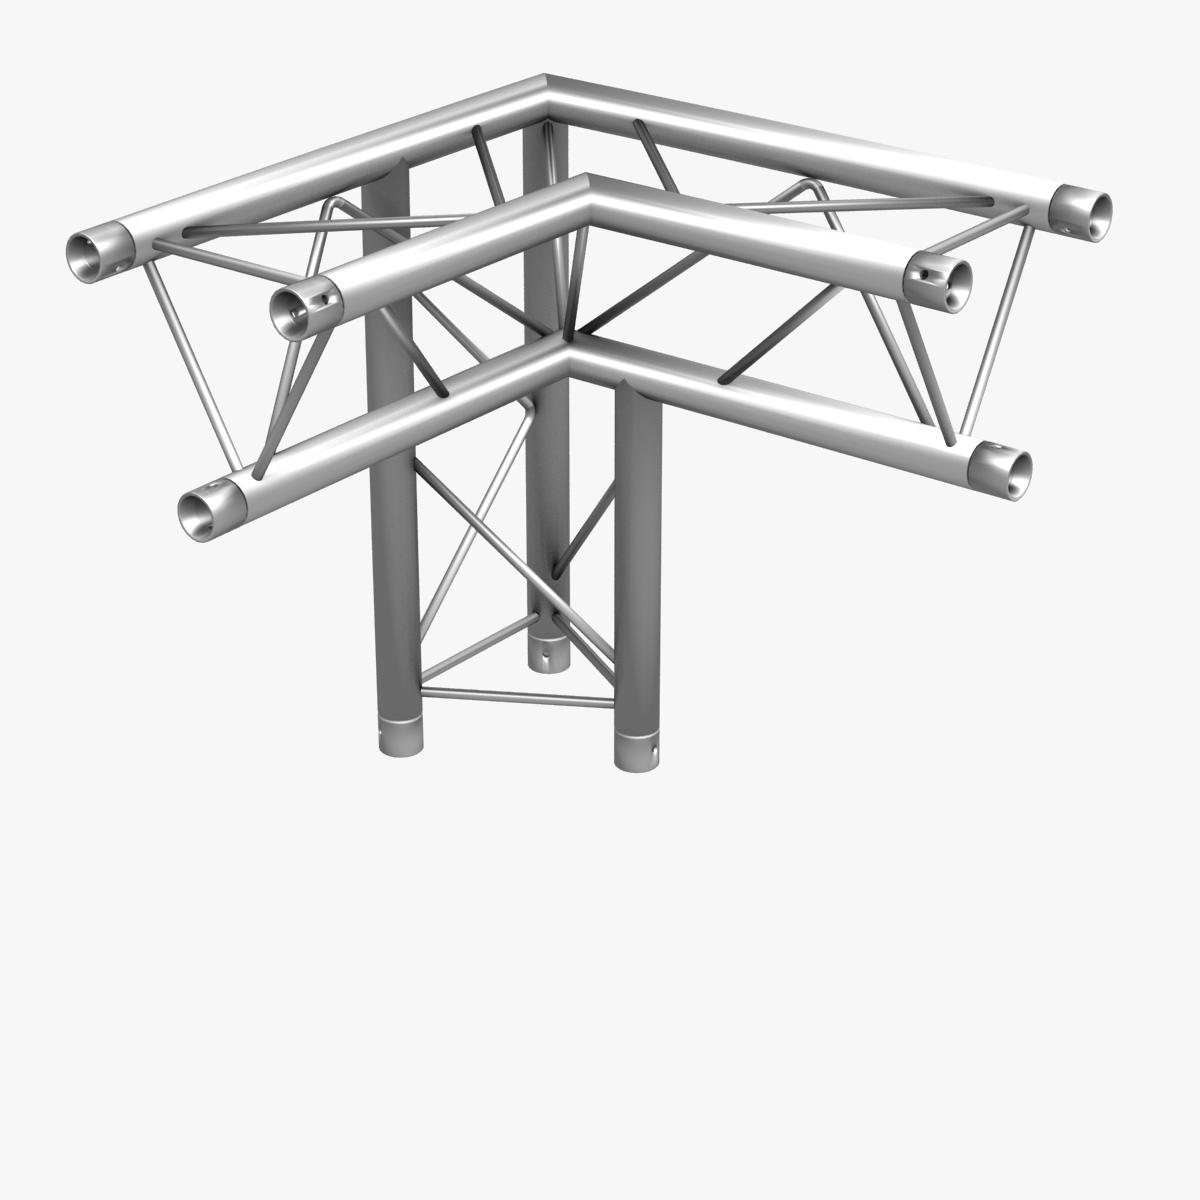 triangular trusses (collection 55 modular pieces) 3d model 3ds max dxf fbx c4d dae texture obj 216264